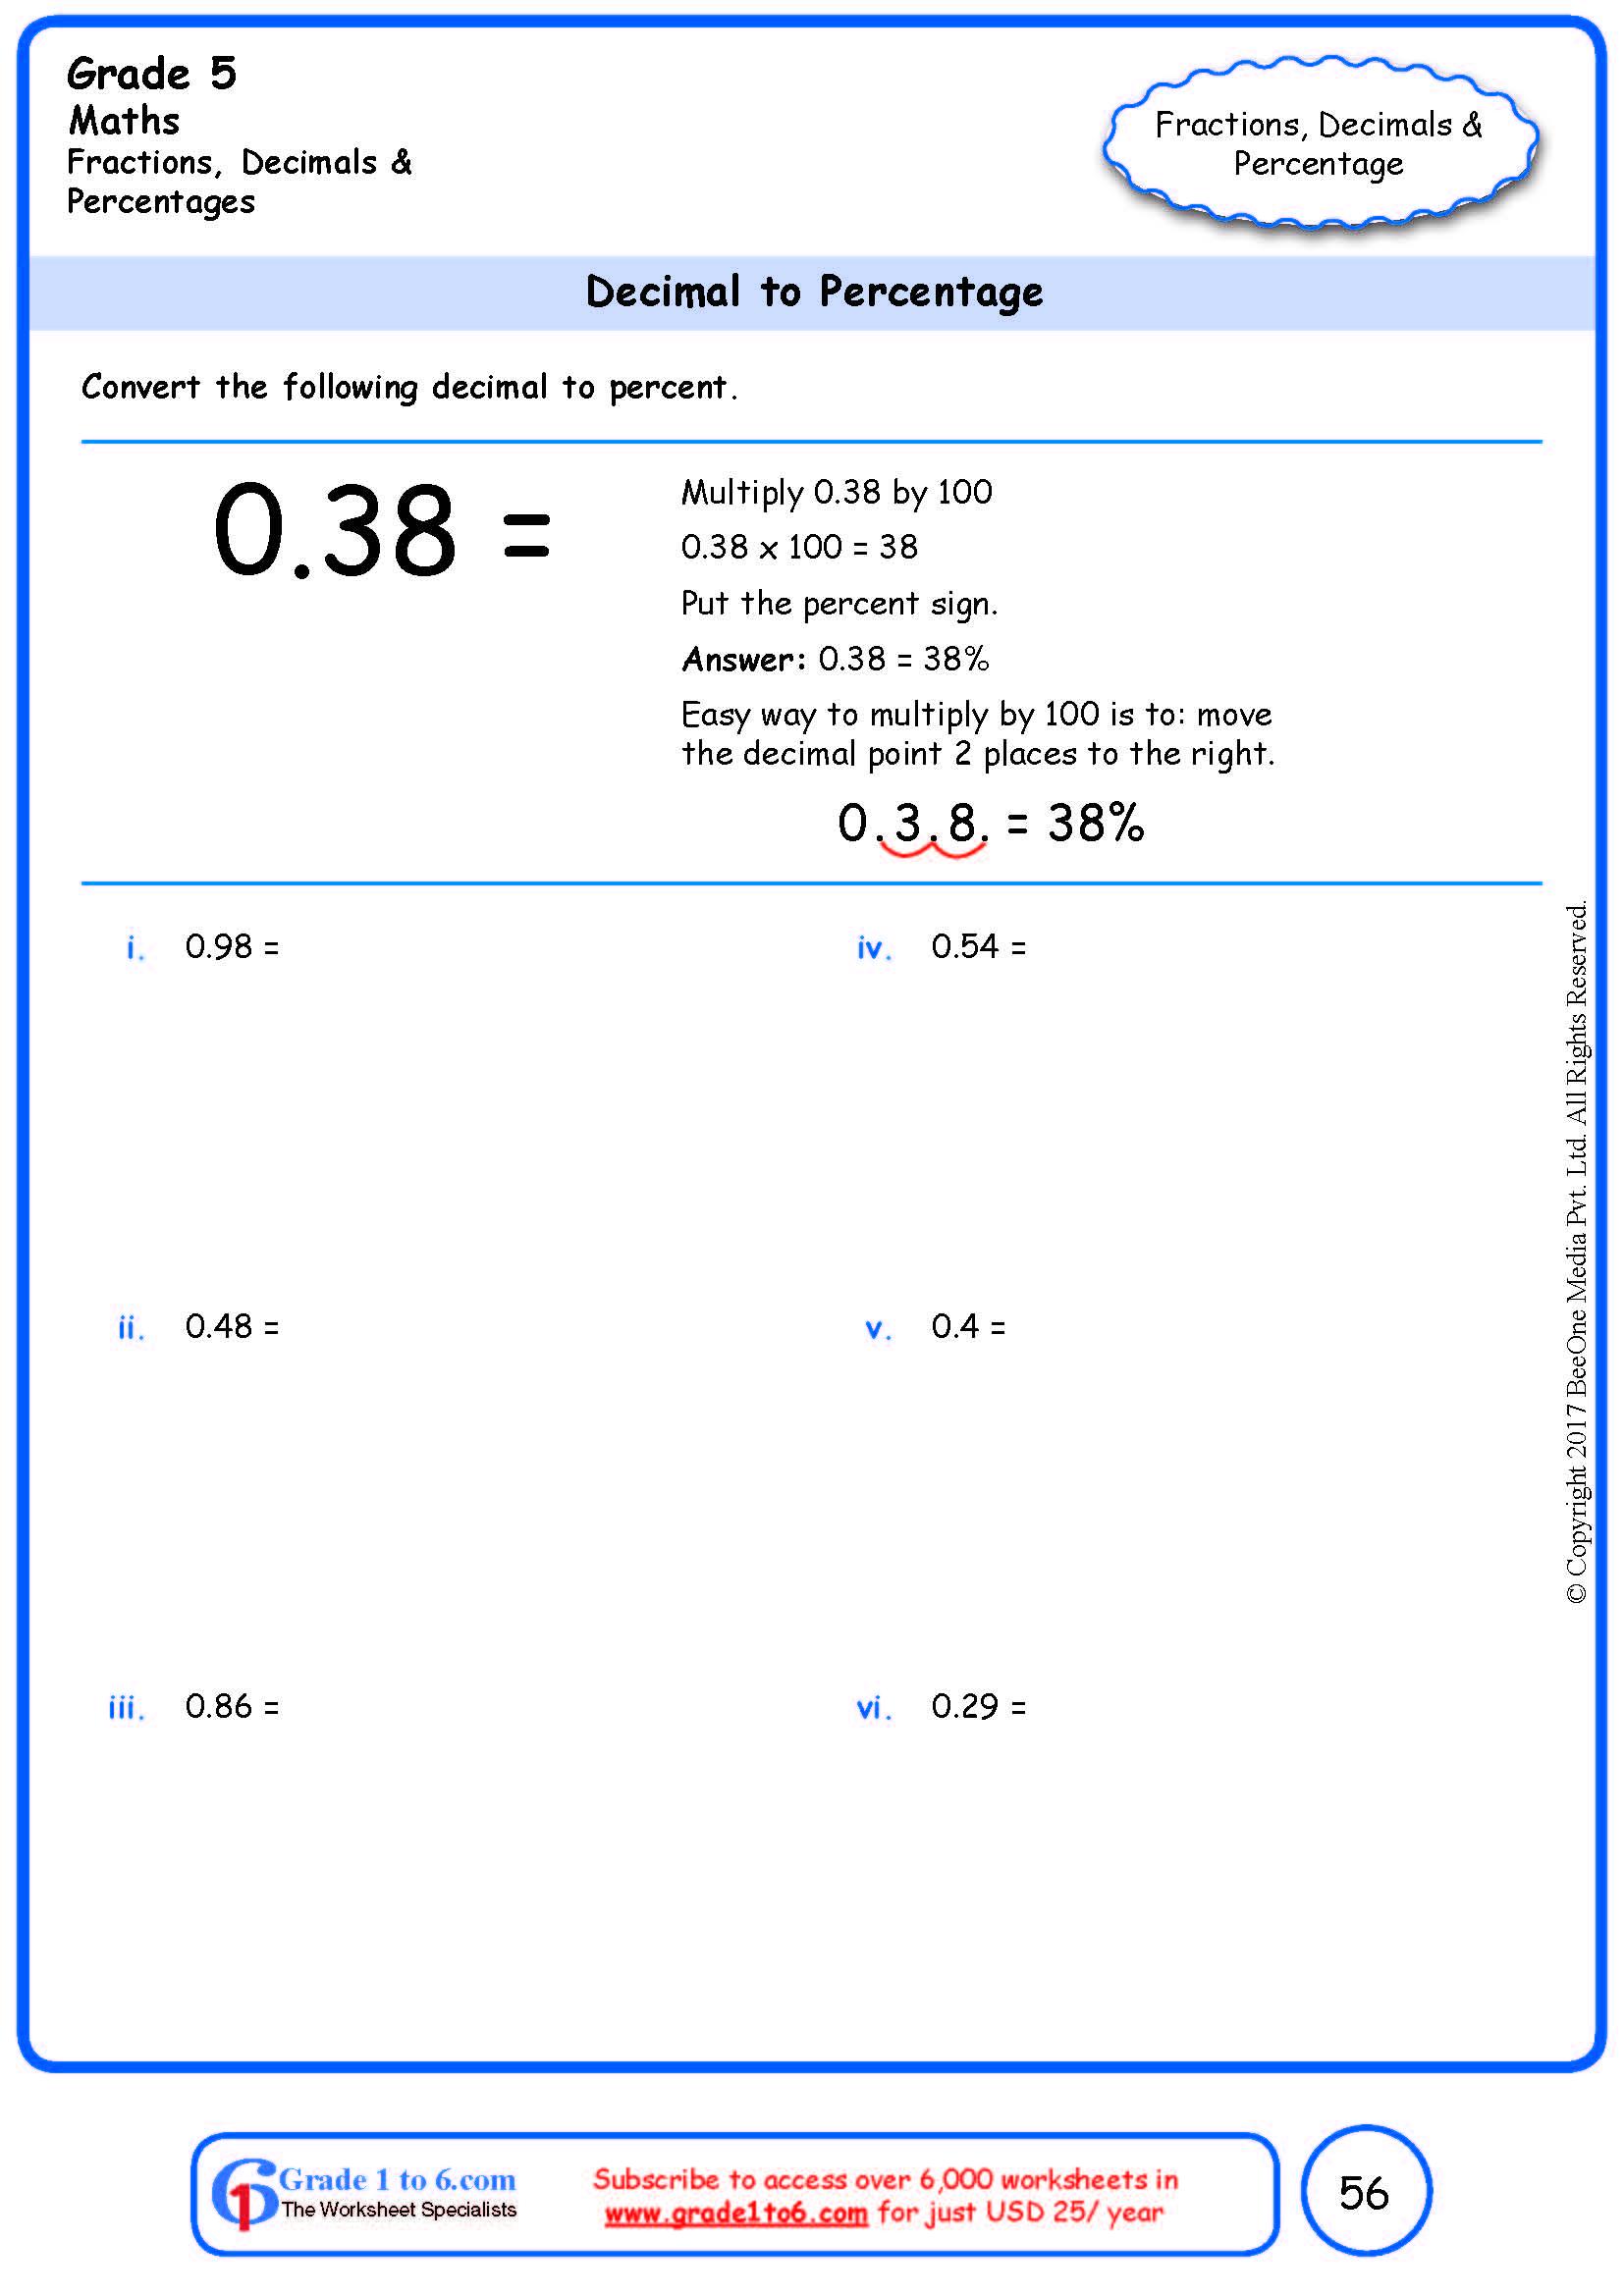 hight resolution of Grade 5 Decimal to Percentage Conversion www.grade1to6.com